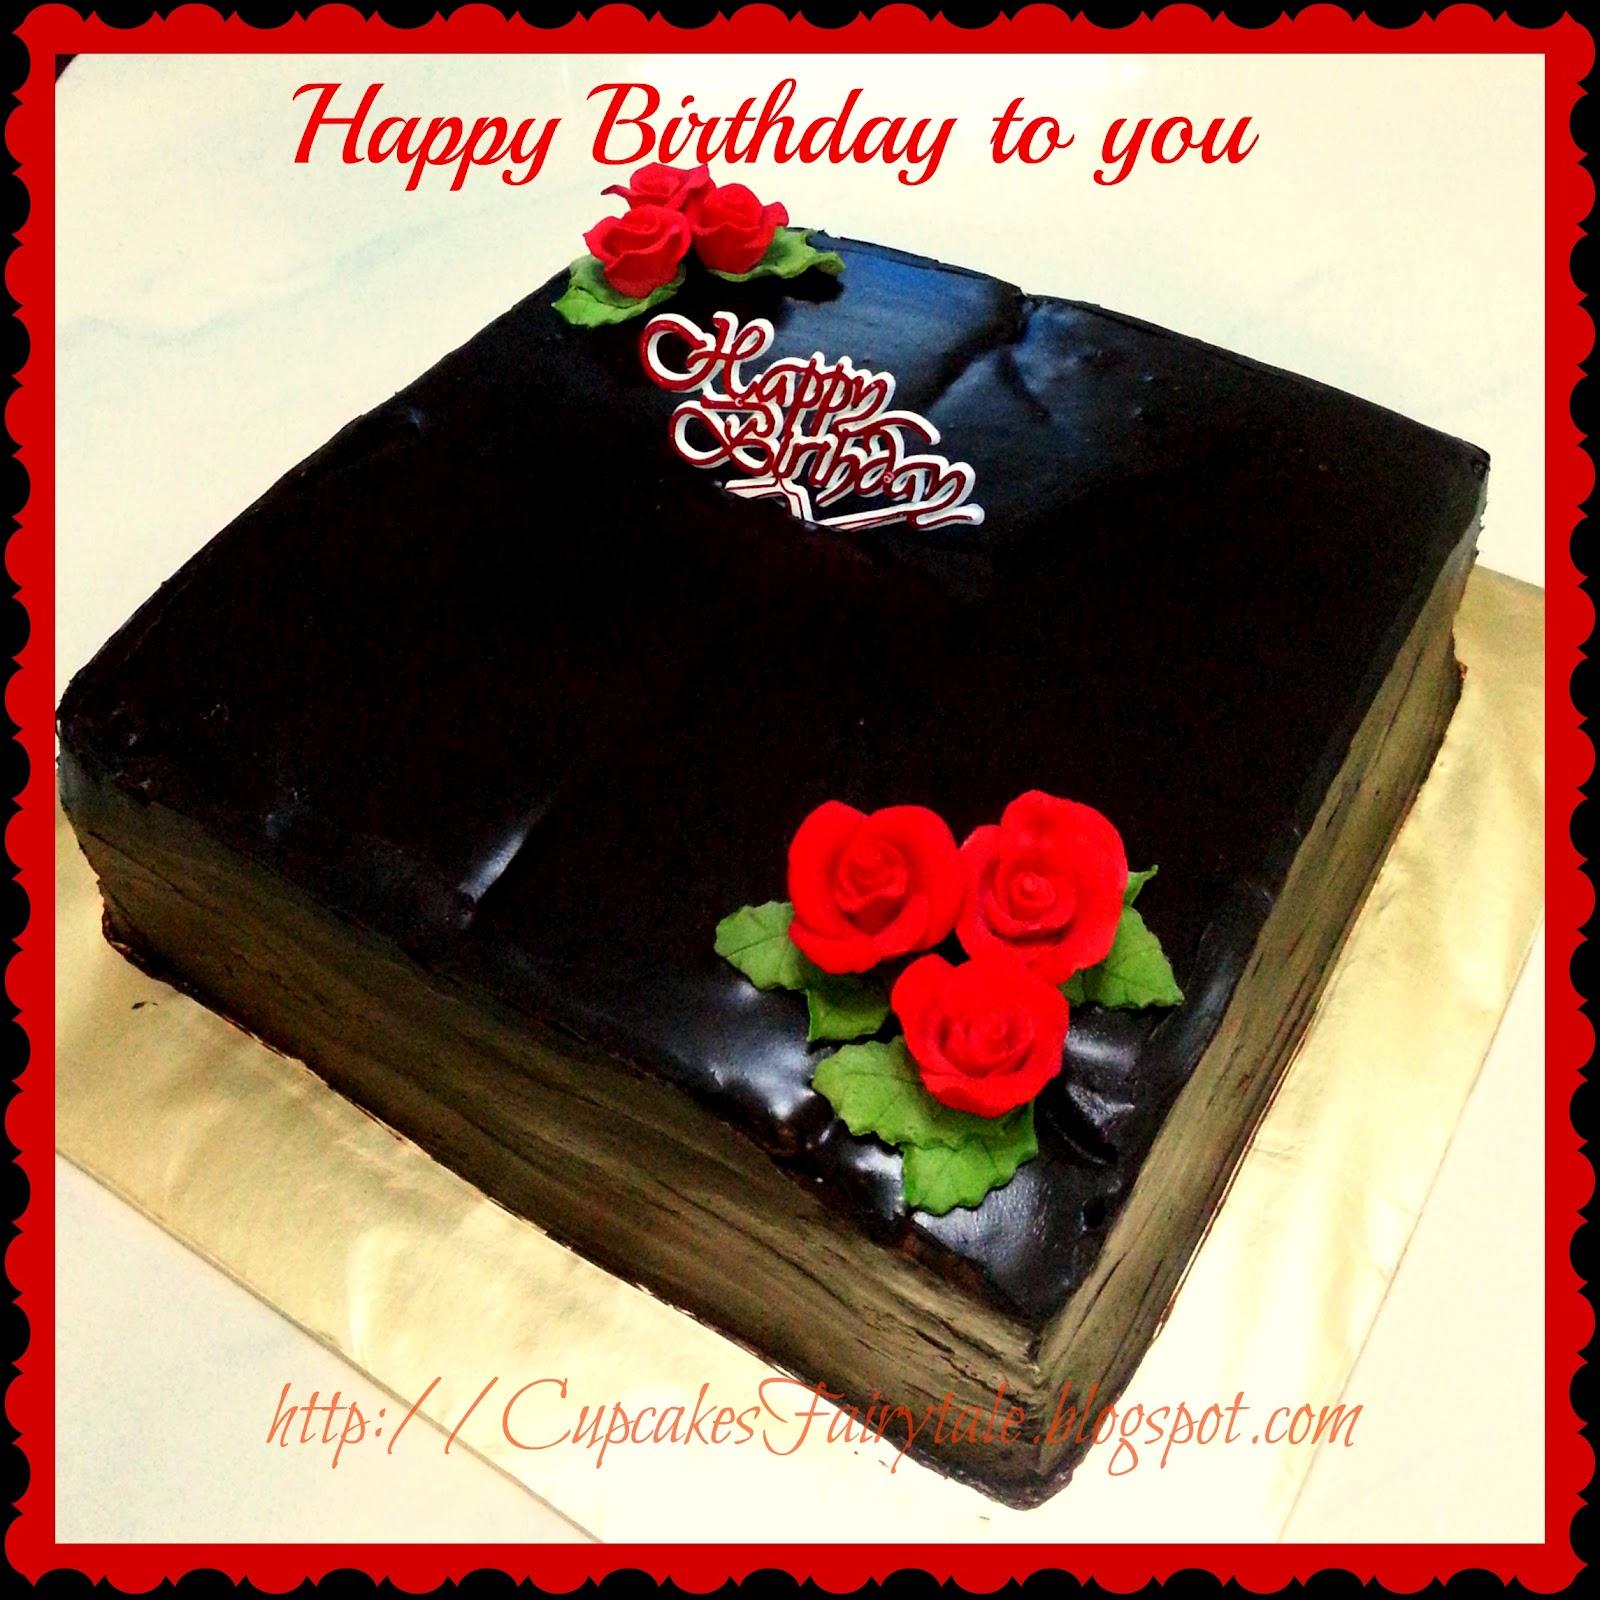 Cupcakes Fairytale: YVONNE YEO'S BIRTHDAY CAKE FOR HUBBY